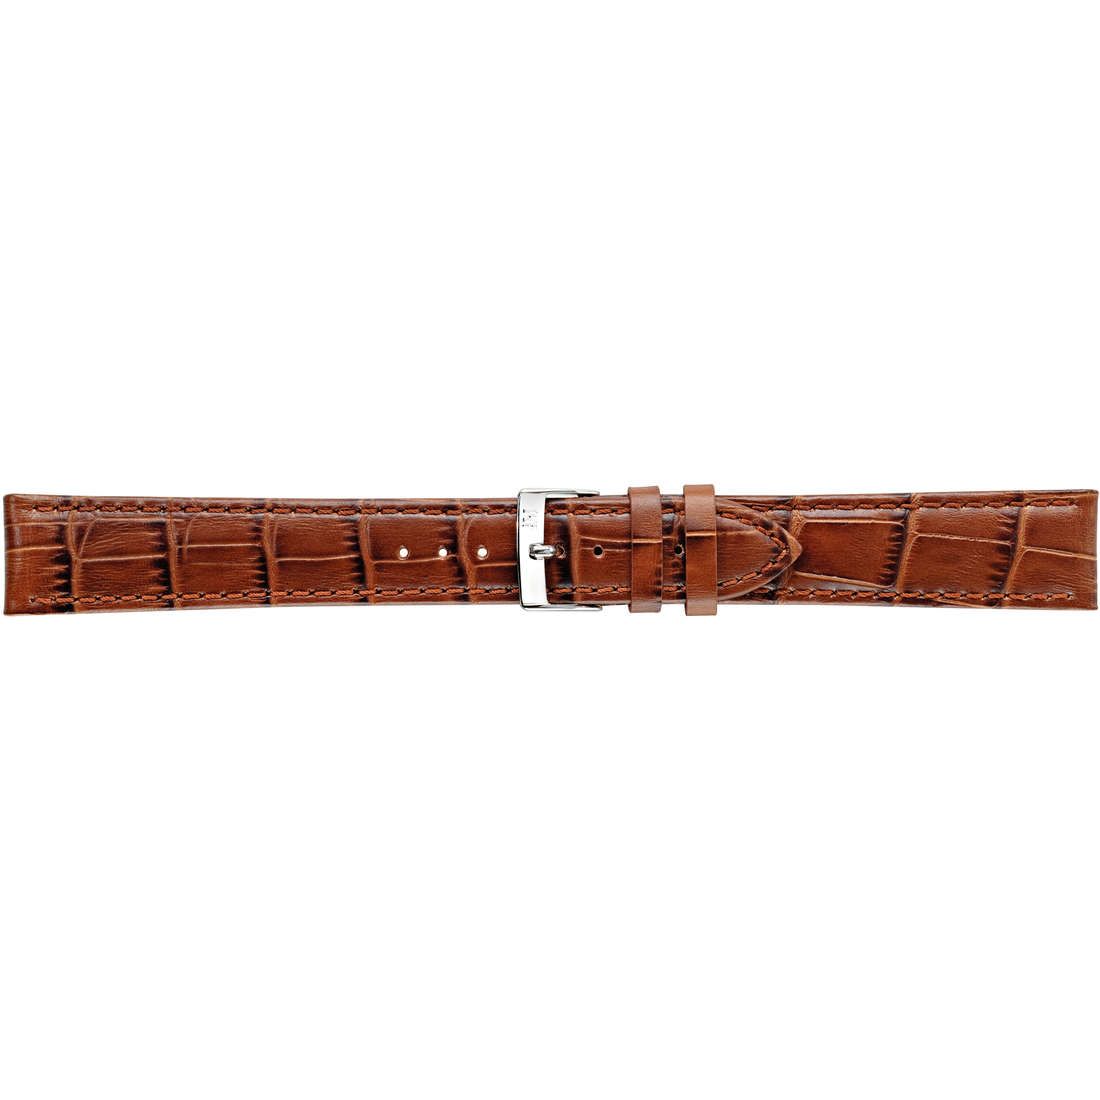 montre bande de montres unisex Morellato I Lunghi A01Y2269480041CR20